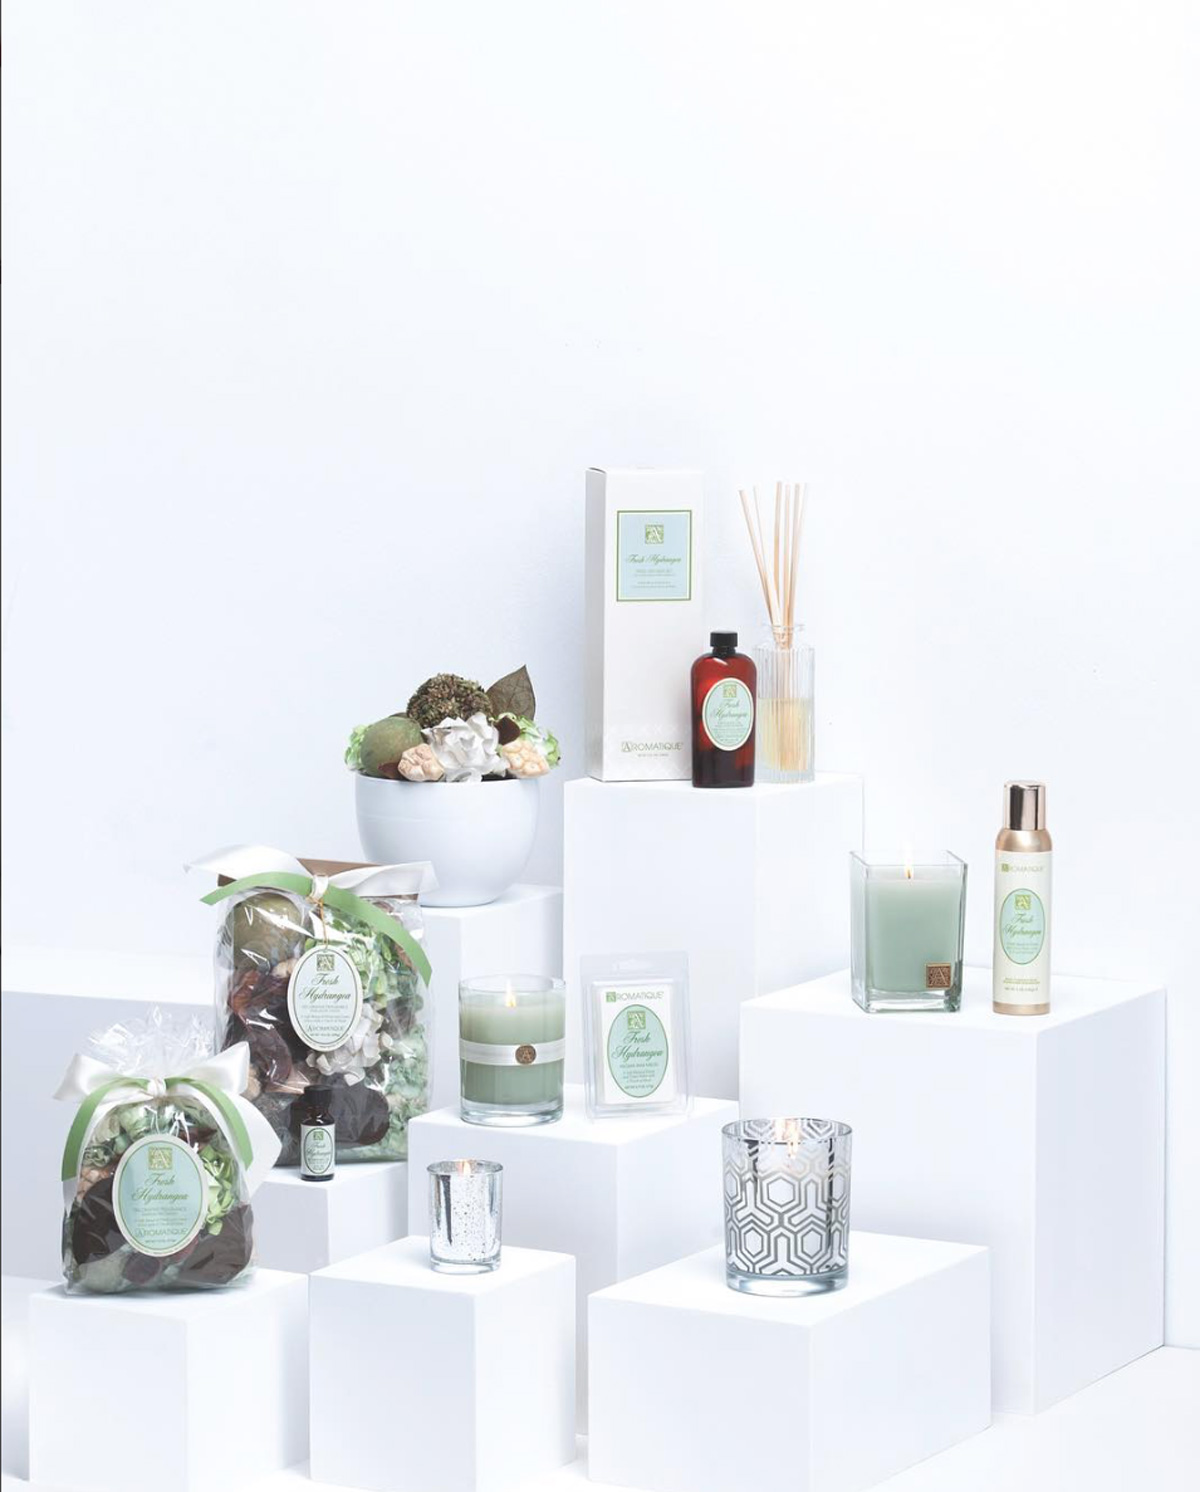 Aromatique at Regel & Company